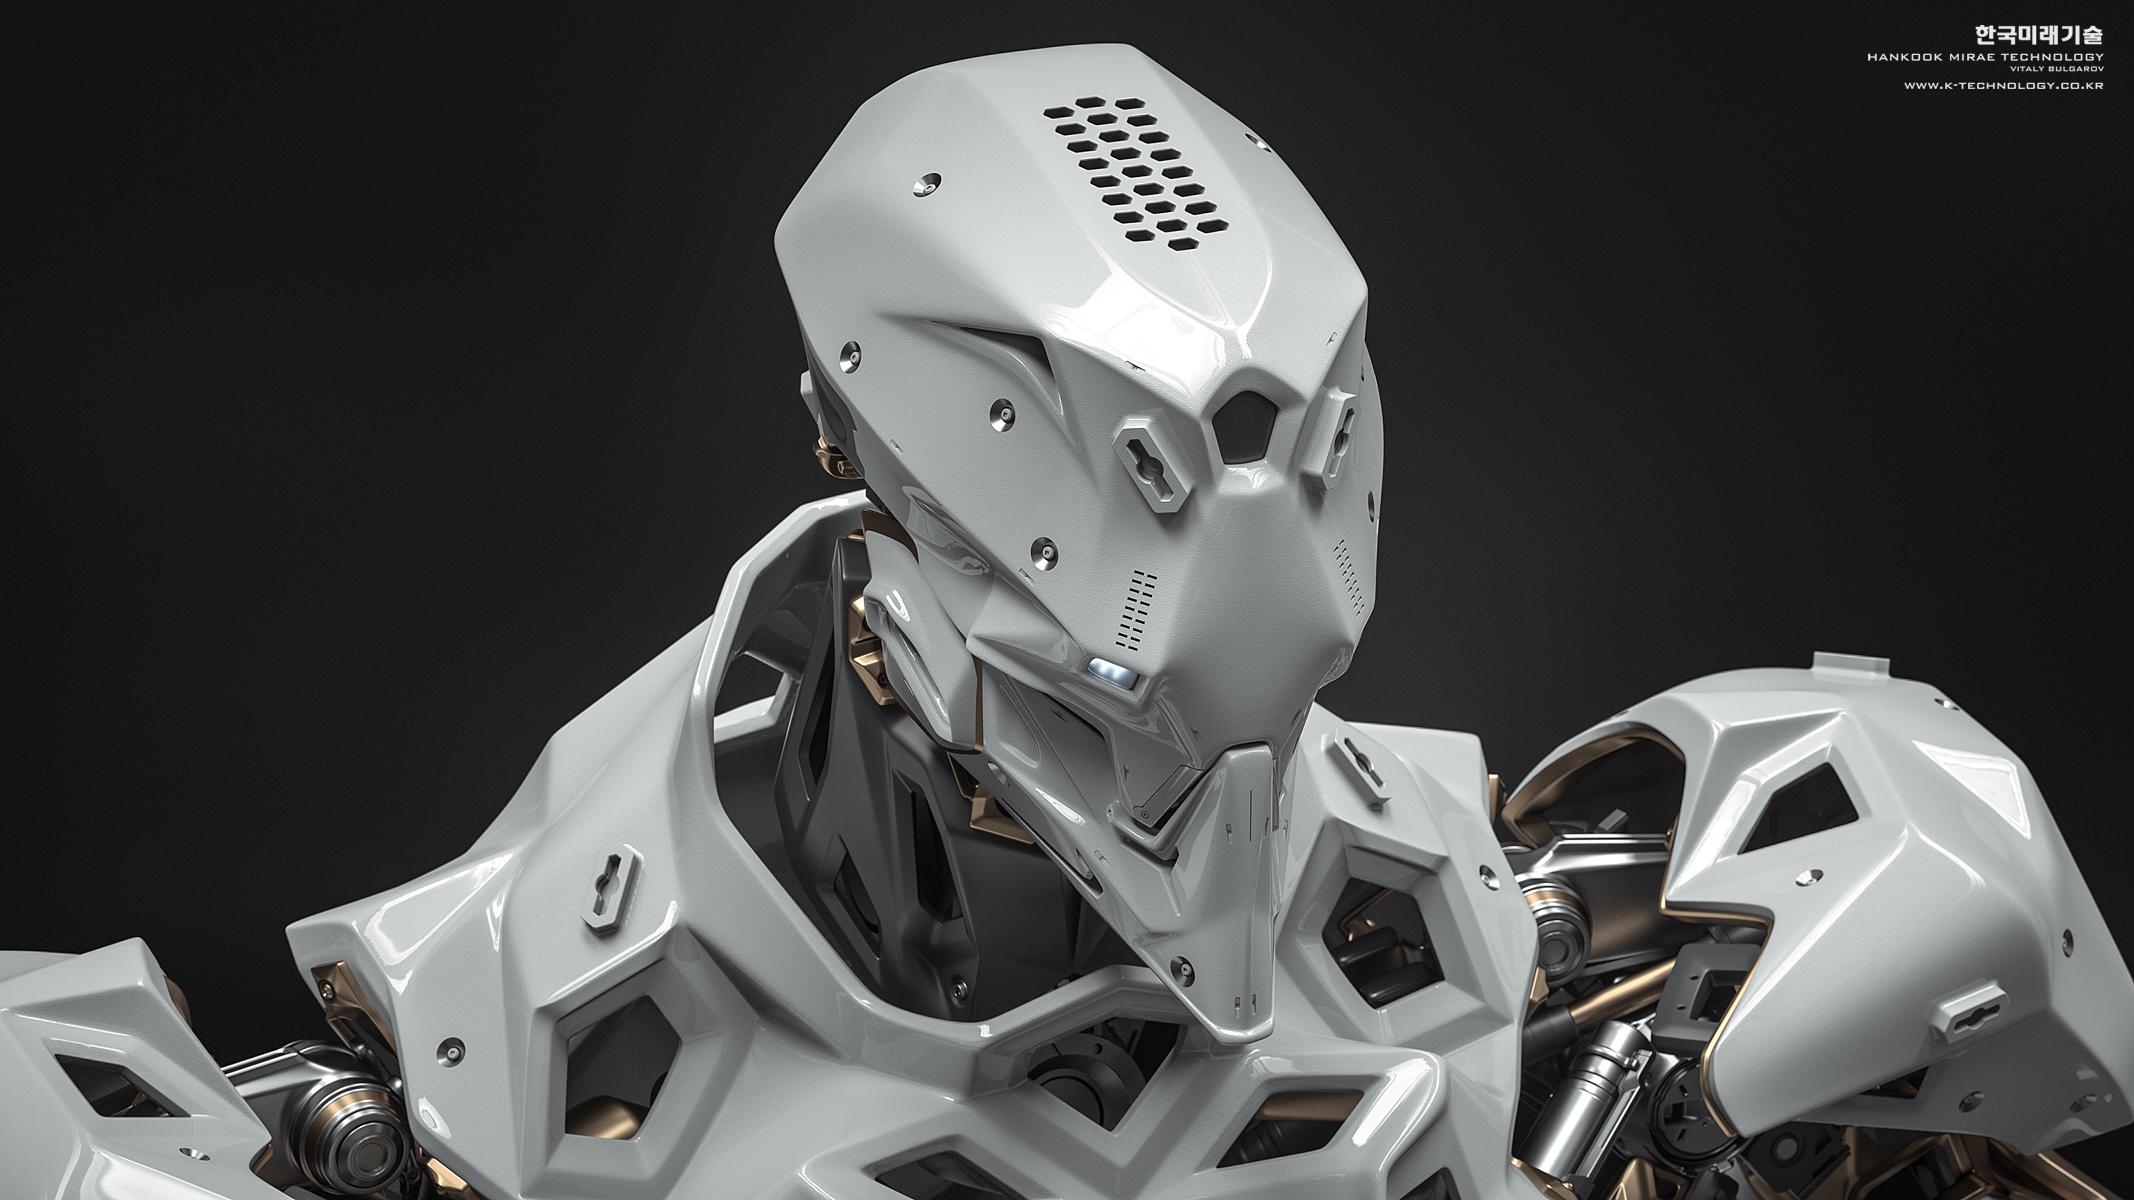 KFT_2.Xm_RobotDesign_ (3 of 29).jpg